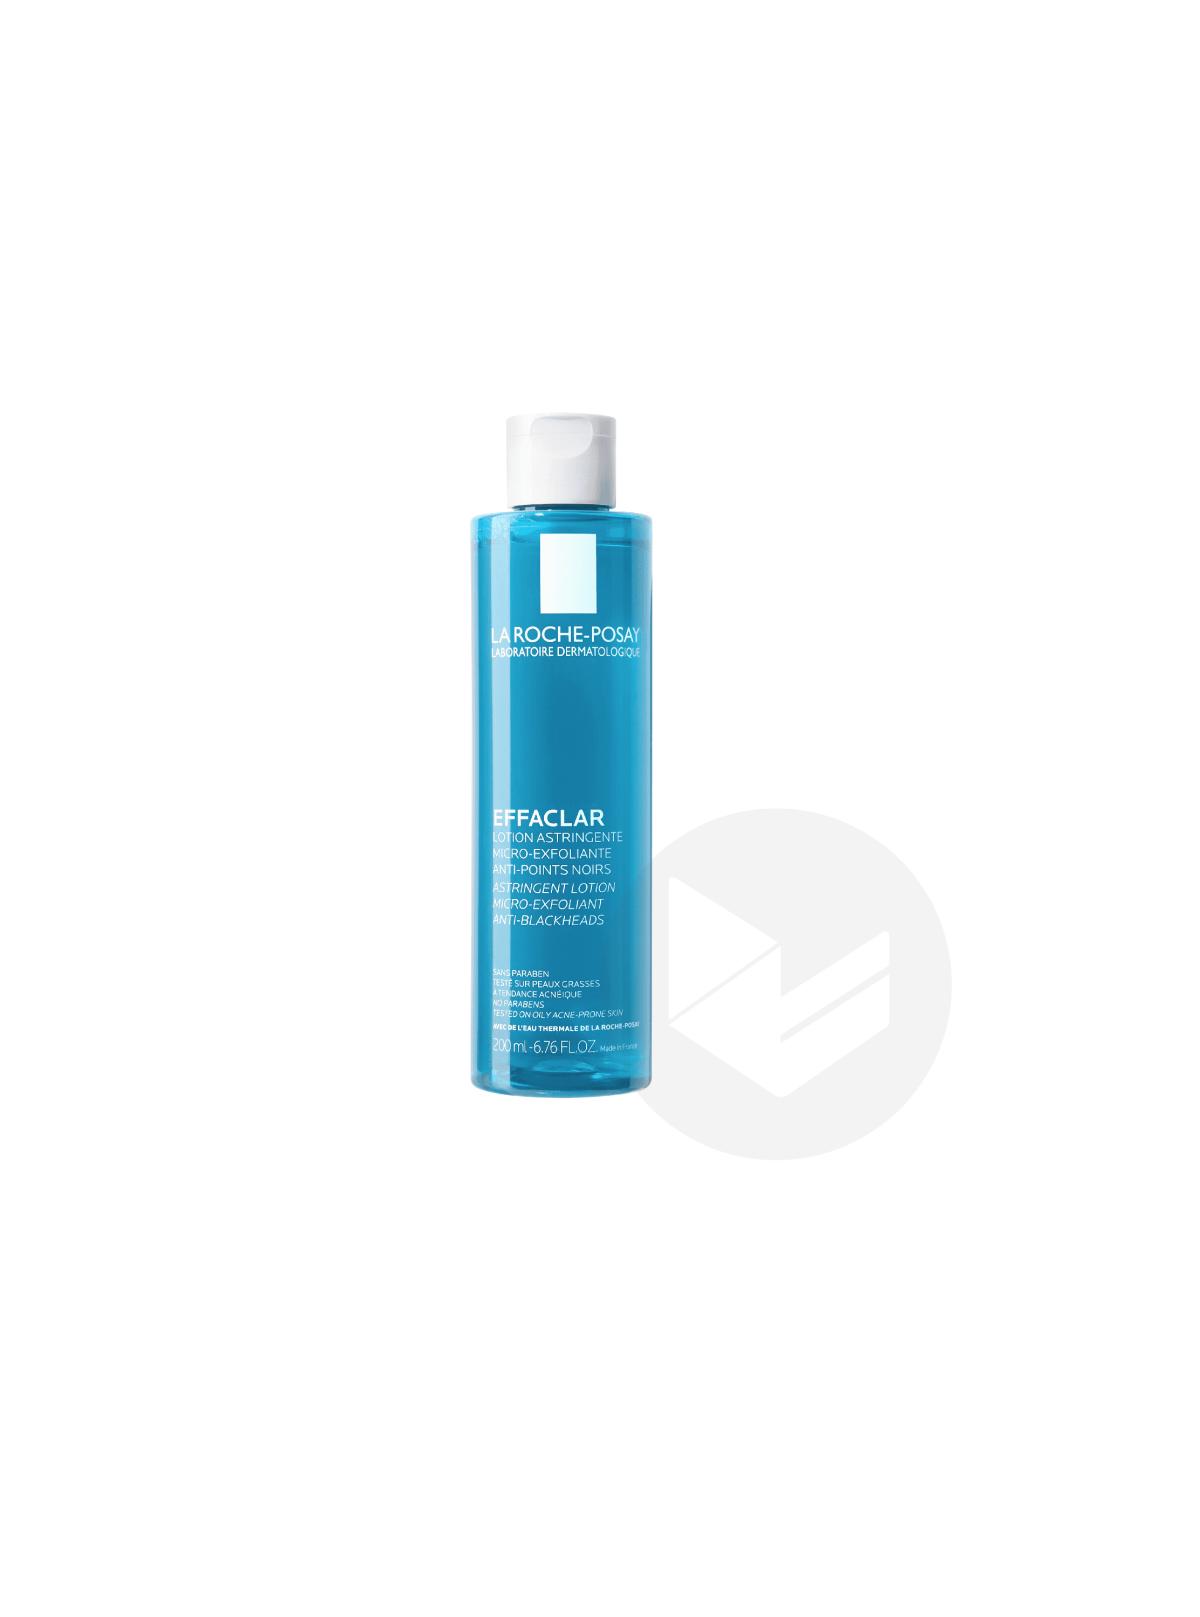 Effaclar Lotion Astringente Micro-Exfoliante 200ml